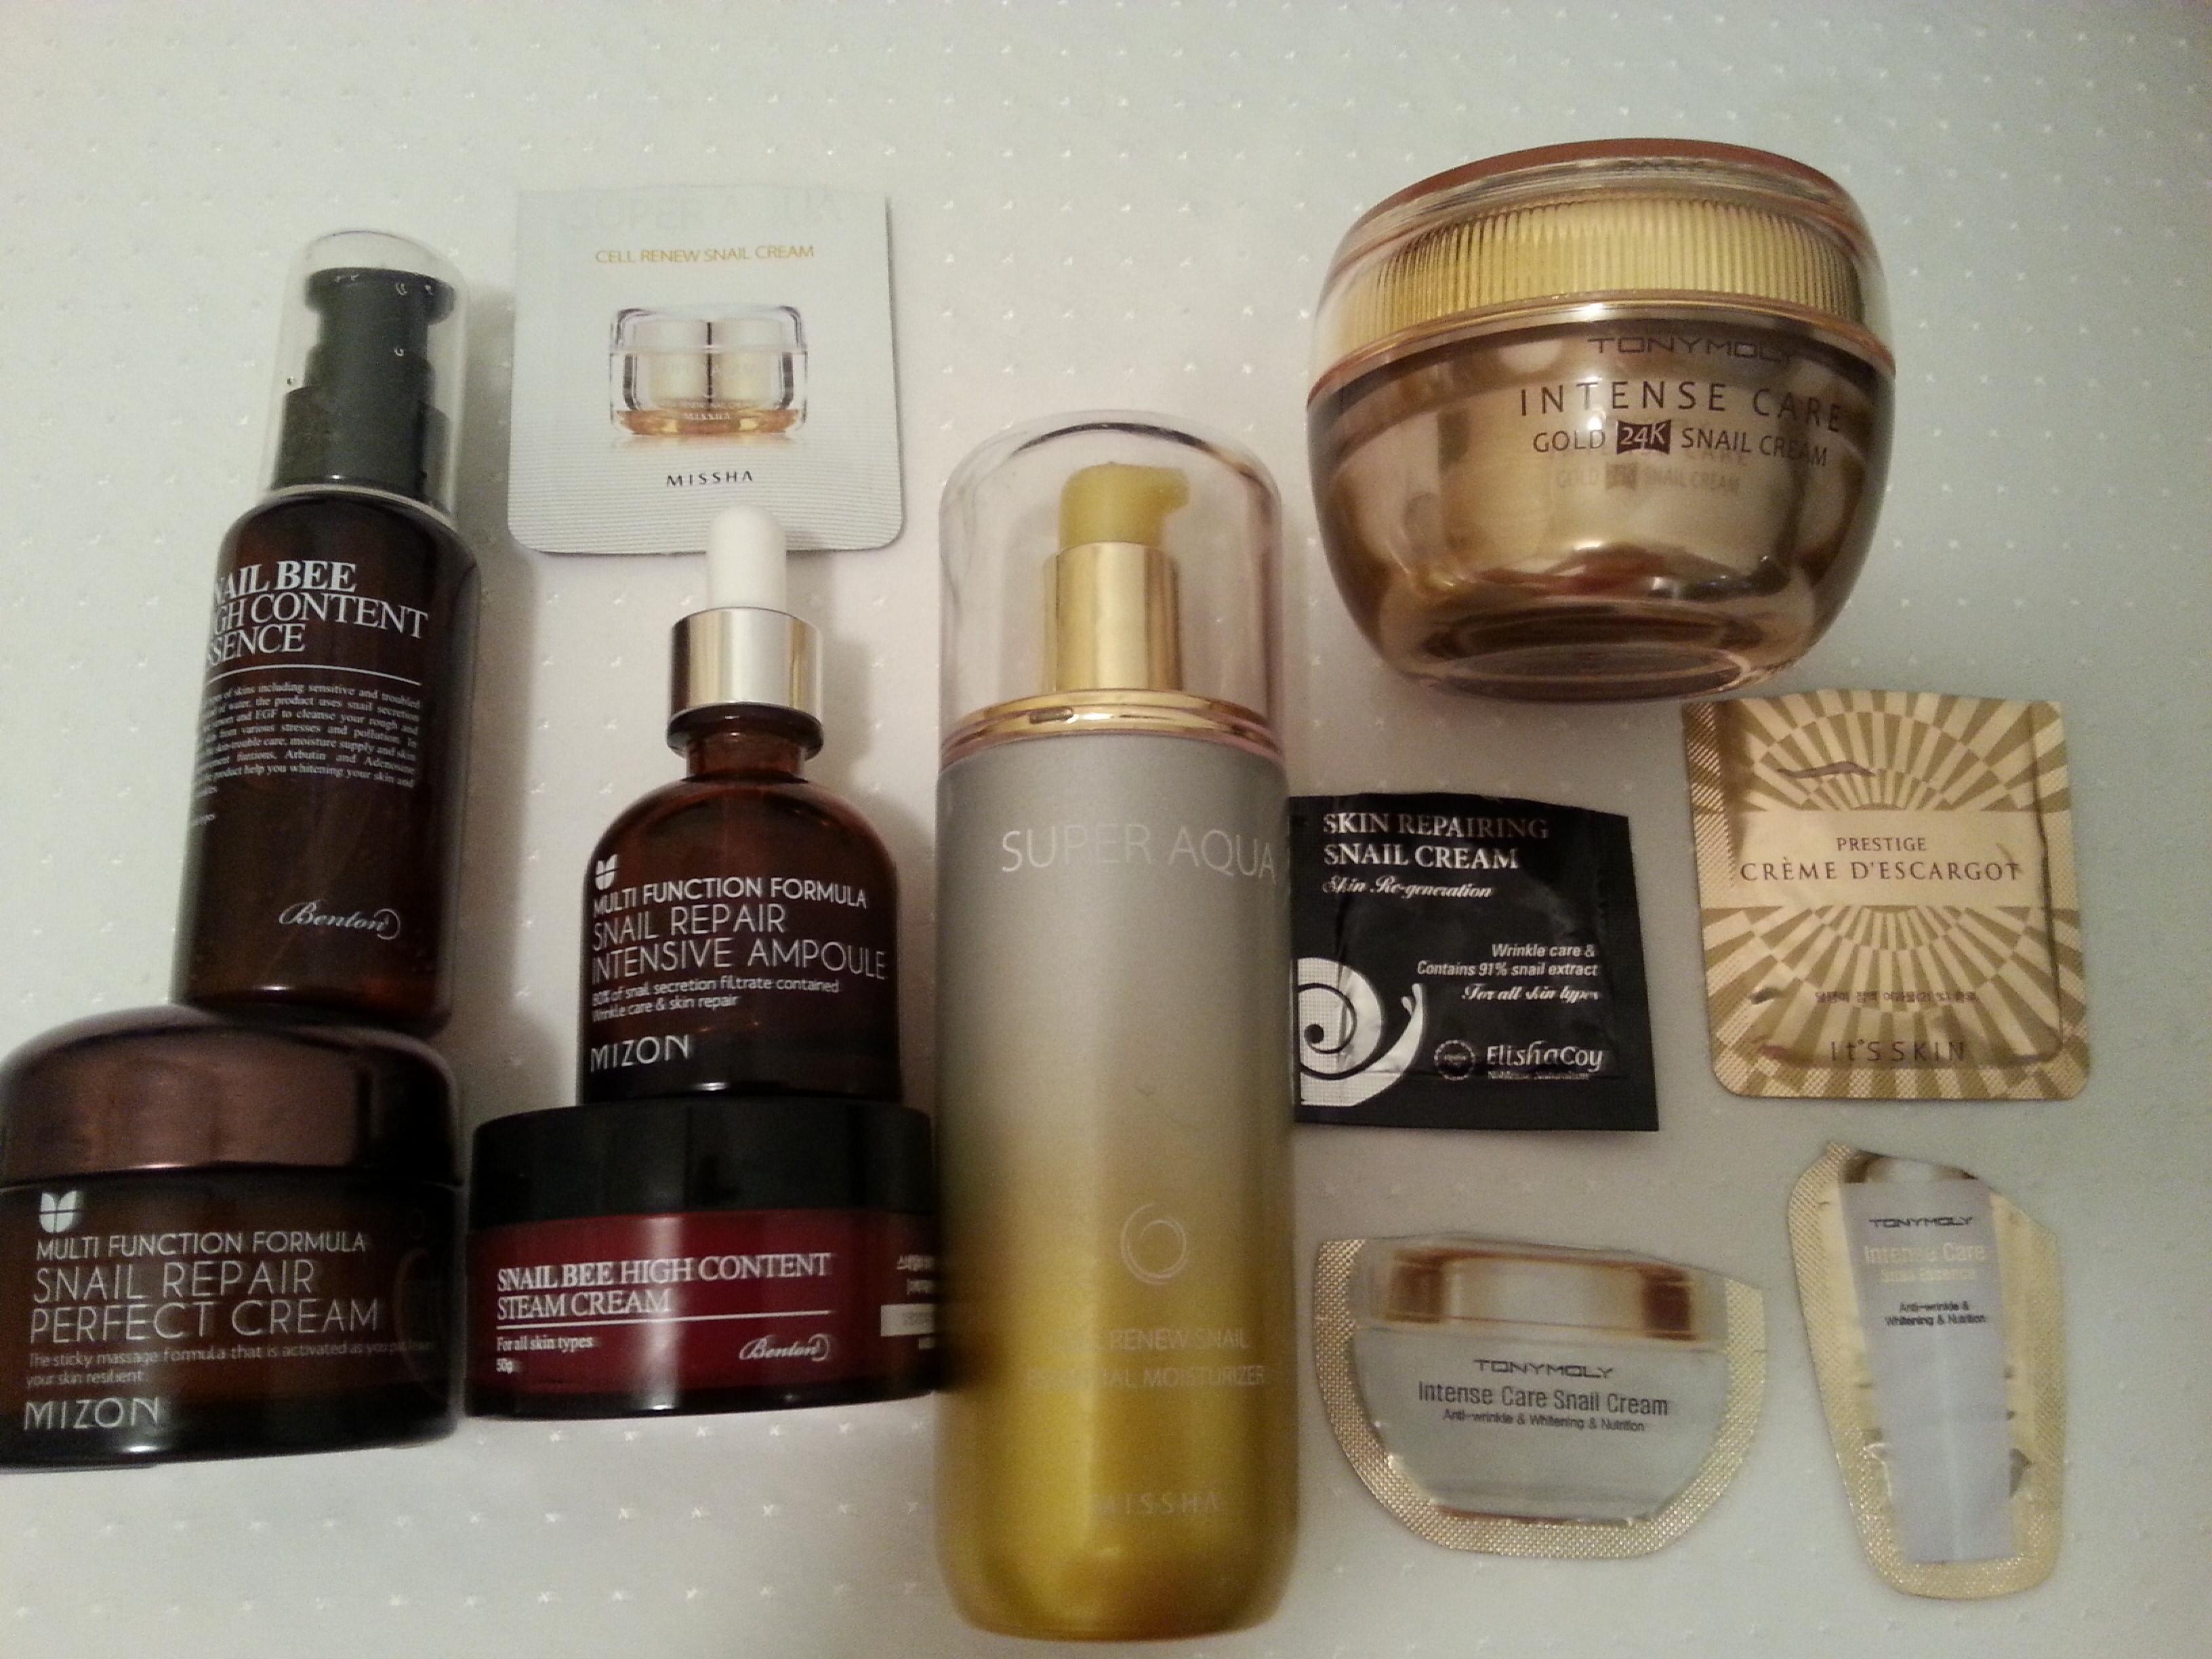 Korean Snail Products-Part 1: Tony Moly. Missha. Mizon. Its Skin ...